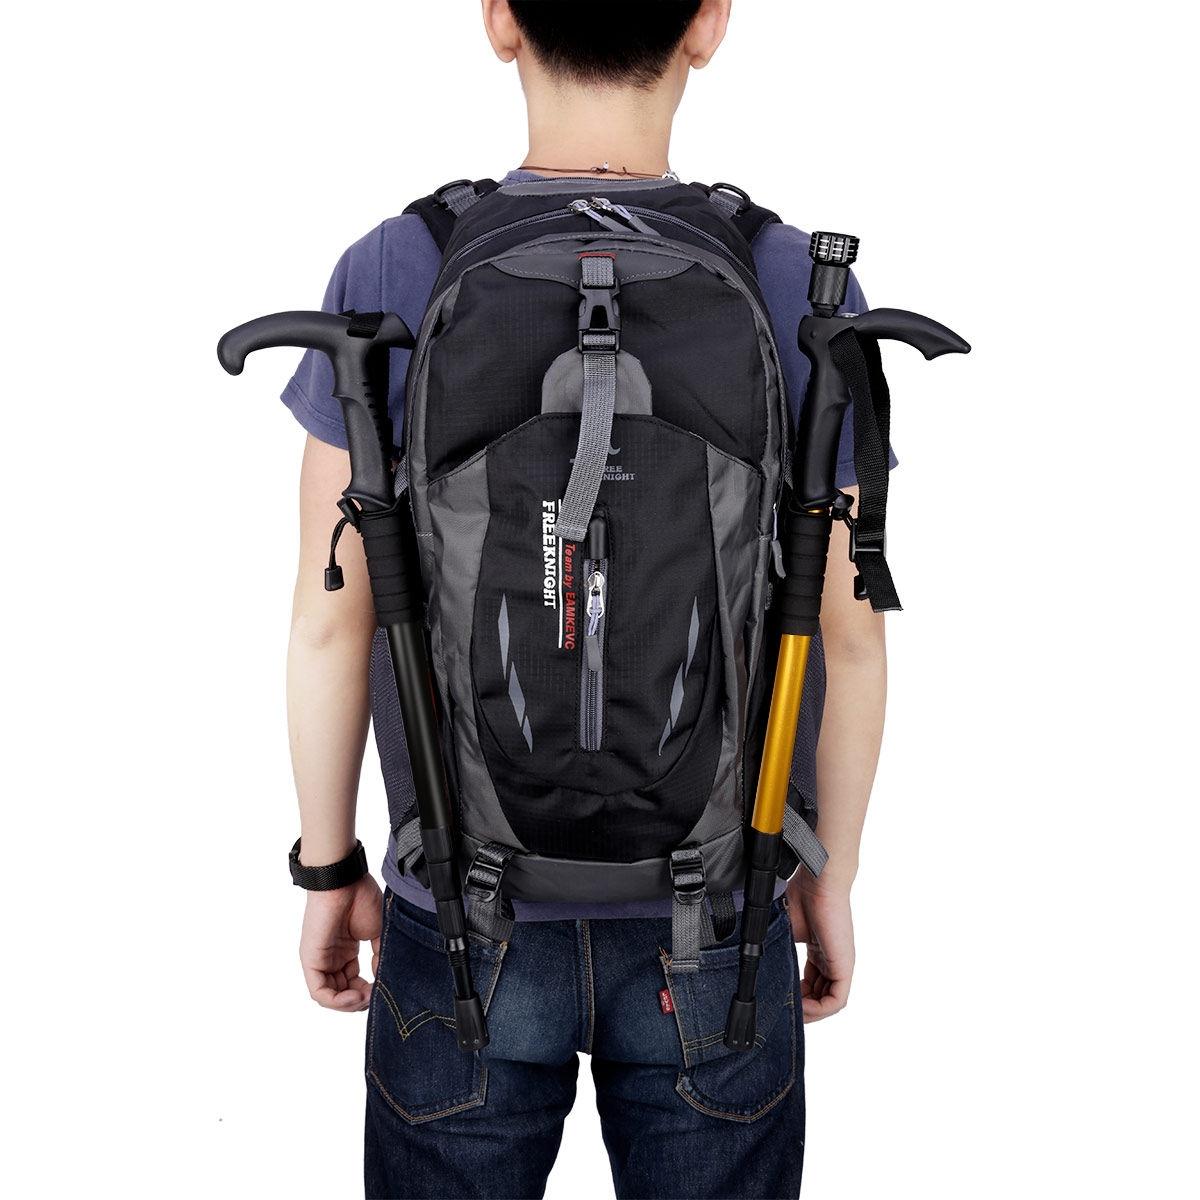 1537eb0dd44b Free Knight Free Knight 005 Outdoor Sports Backpack Hiking Camping  Waterproof Nylon Bag 40L(Black)